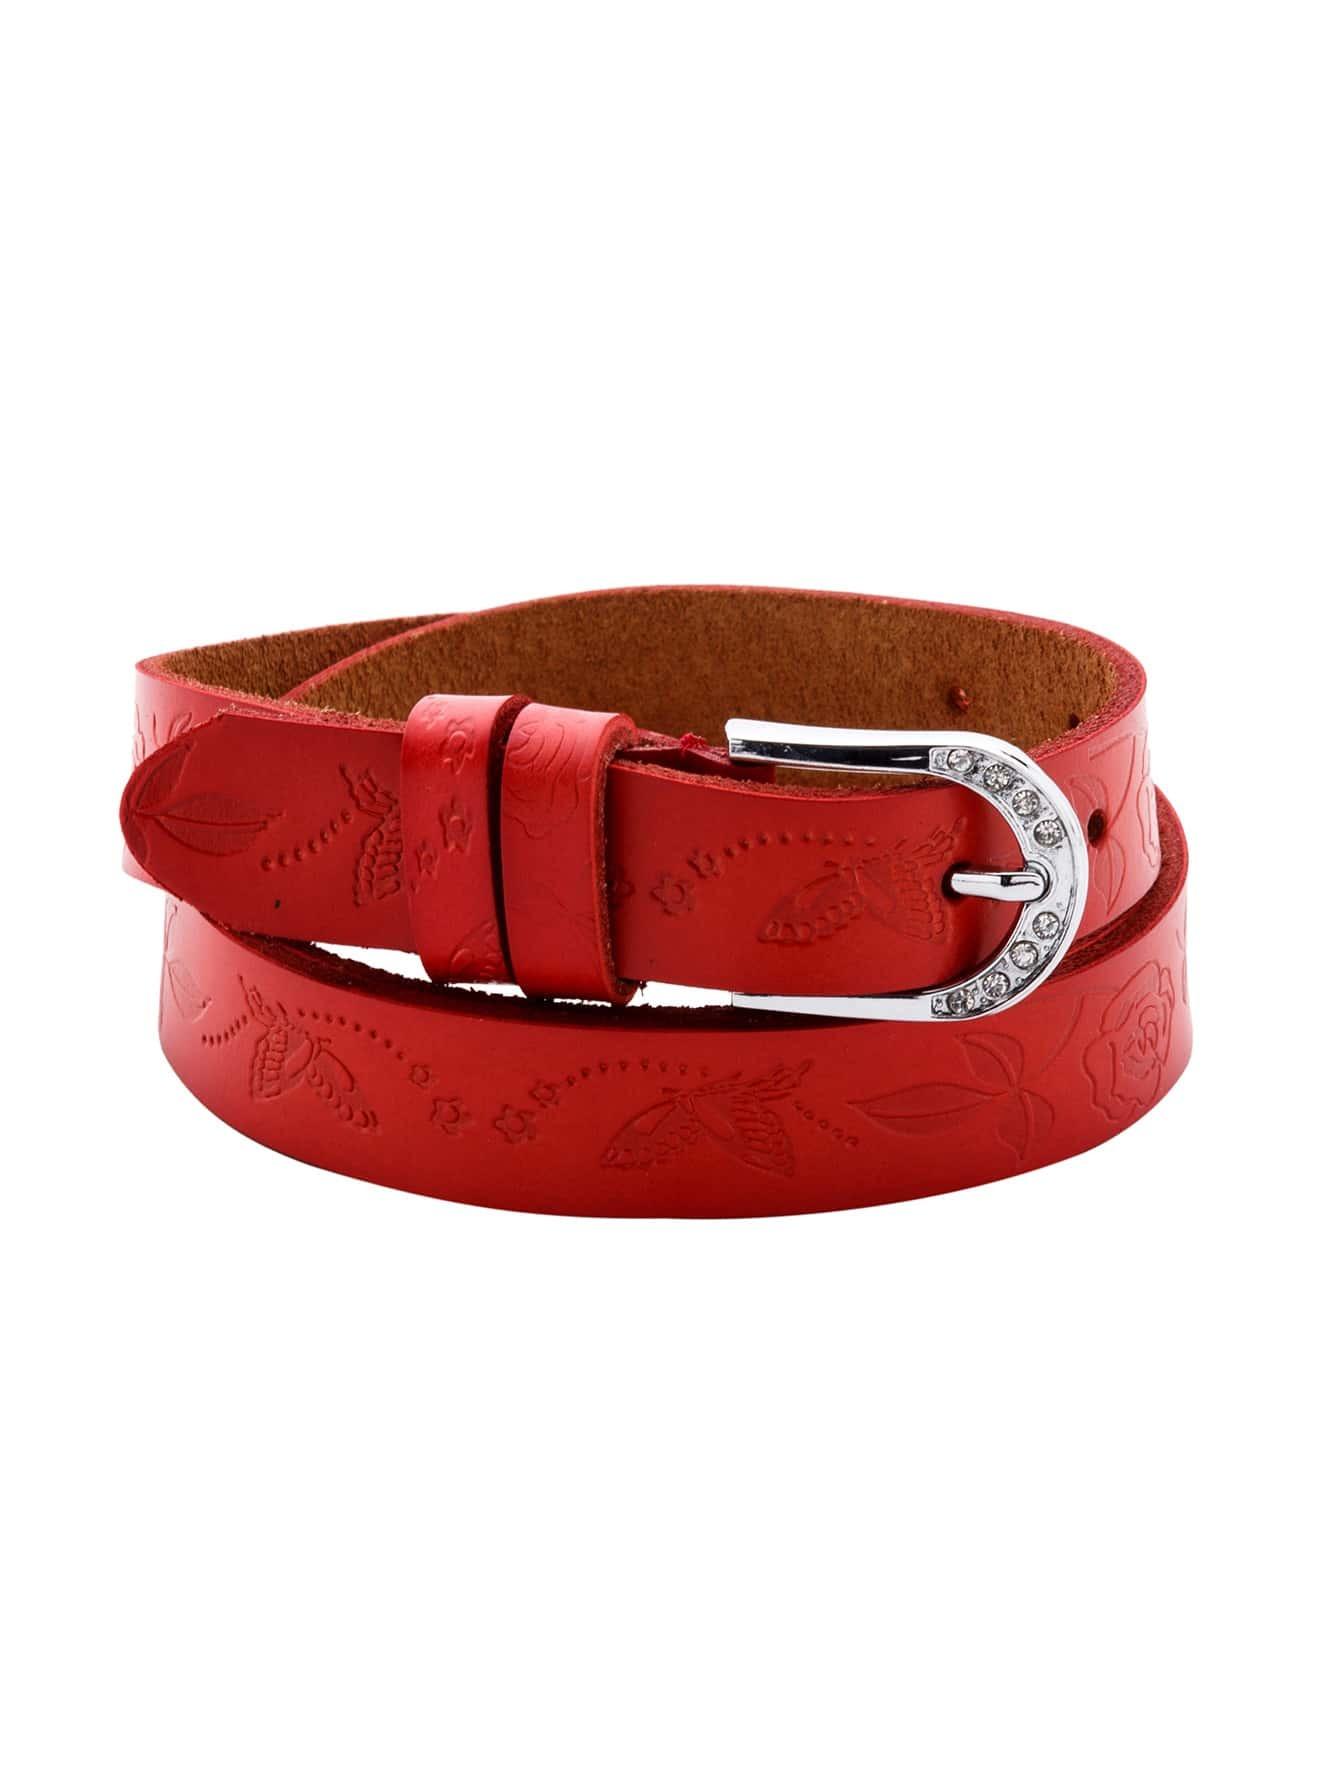 Red Metal Buckle Knurling BeltRed Metal Buckle Knurling Belt<br><br>color: Red<br>size: None